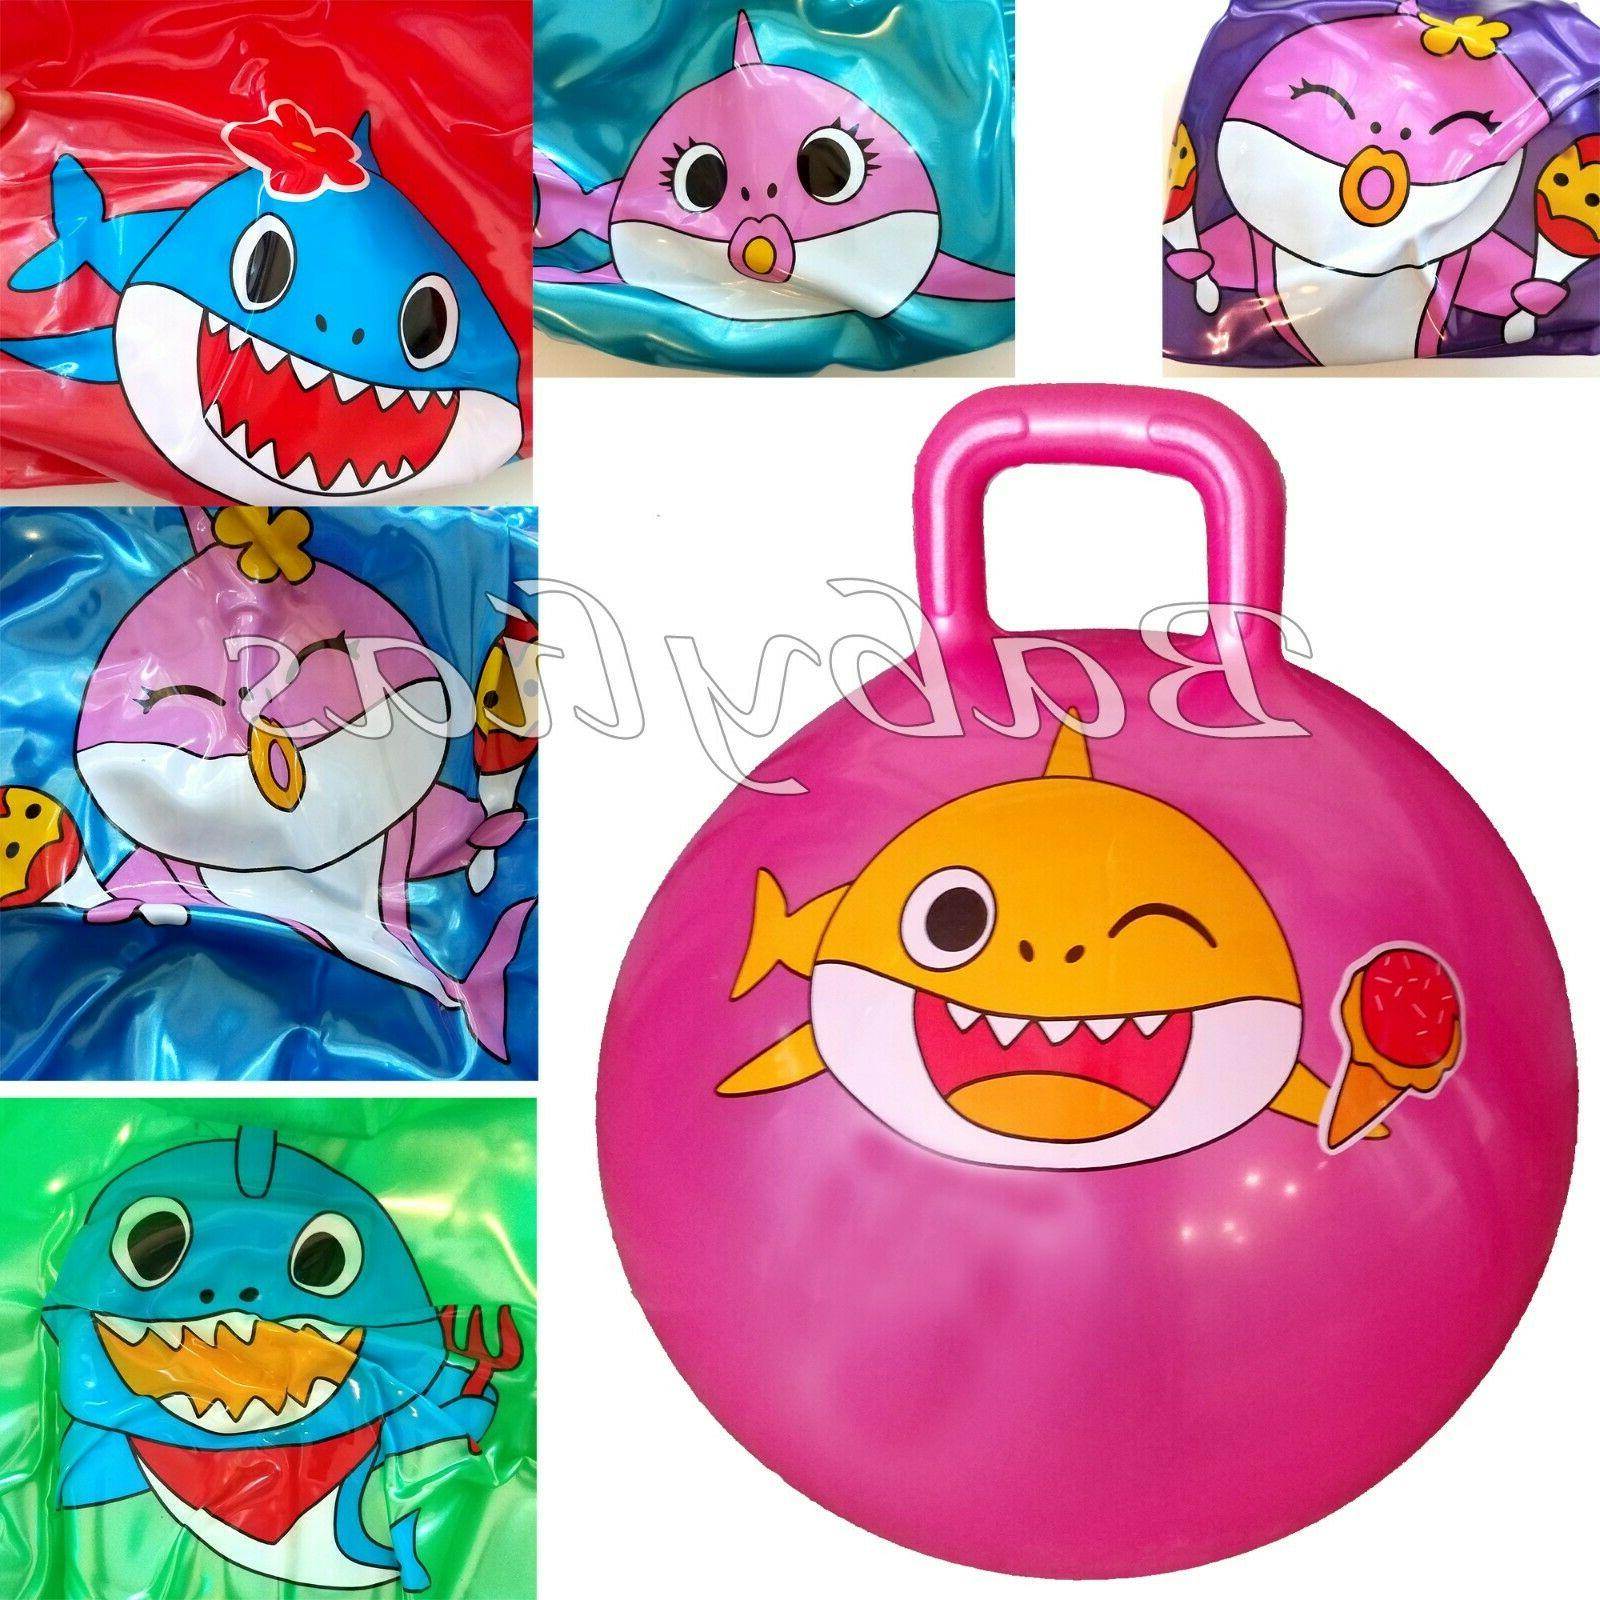 Baby Shark Hopper Ball Bouncy Toy Hippity Hop Jump Ride Boun